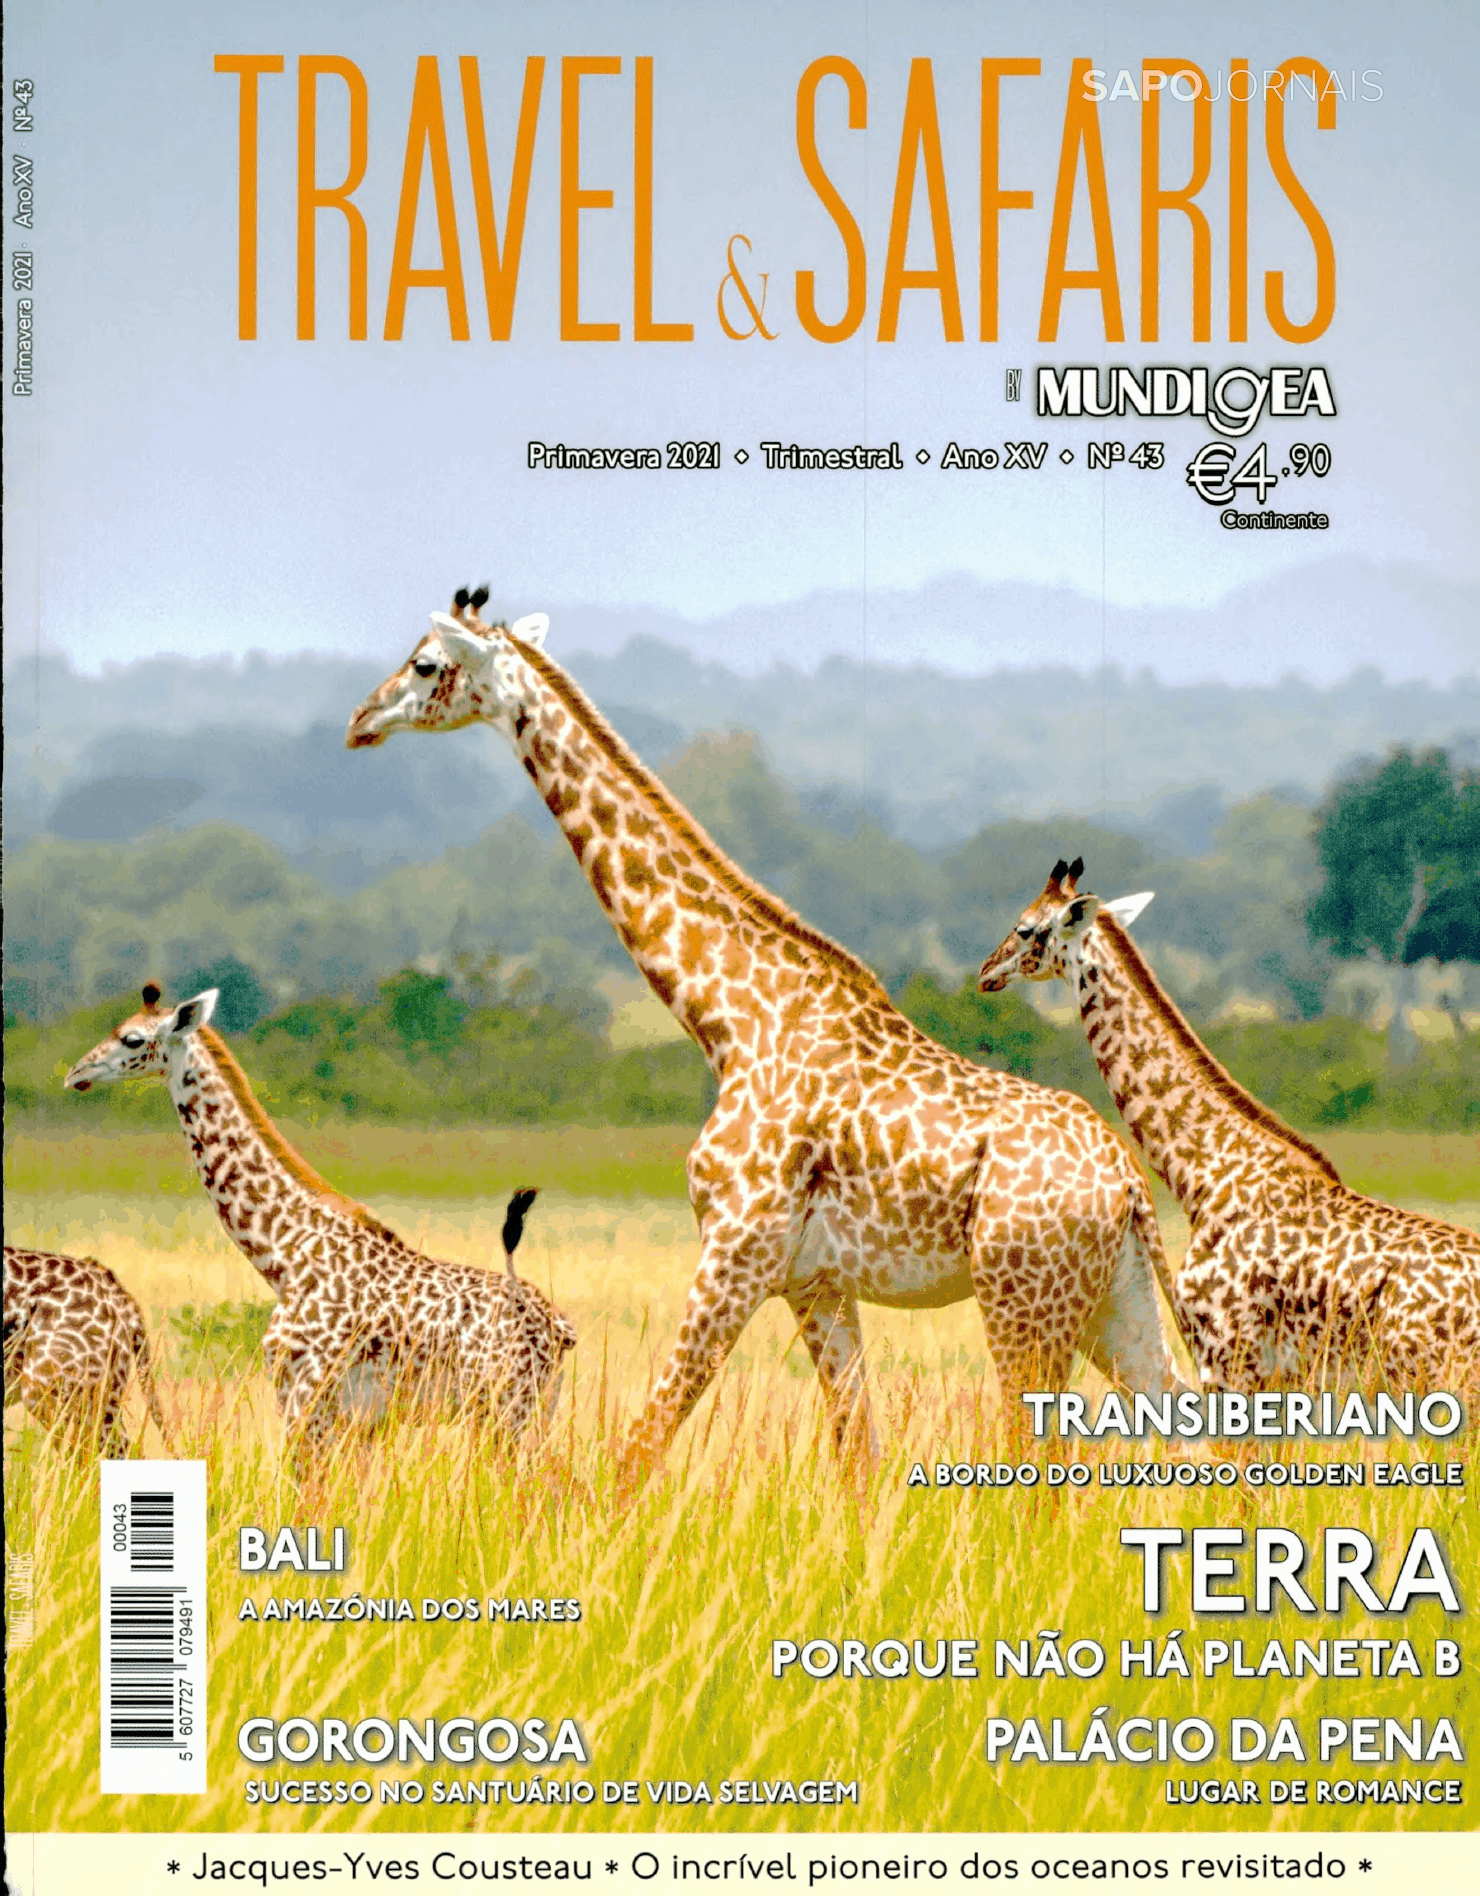 Travel e Safaris